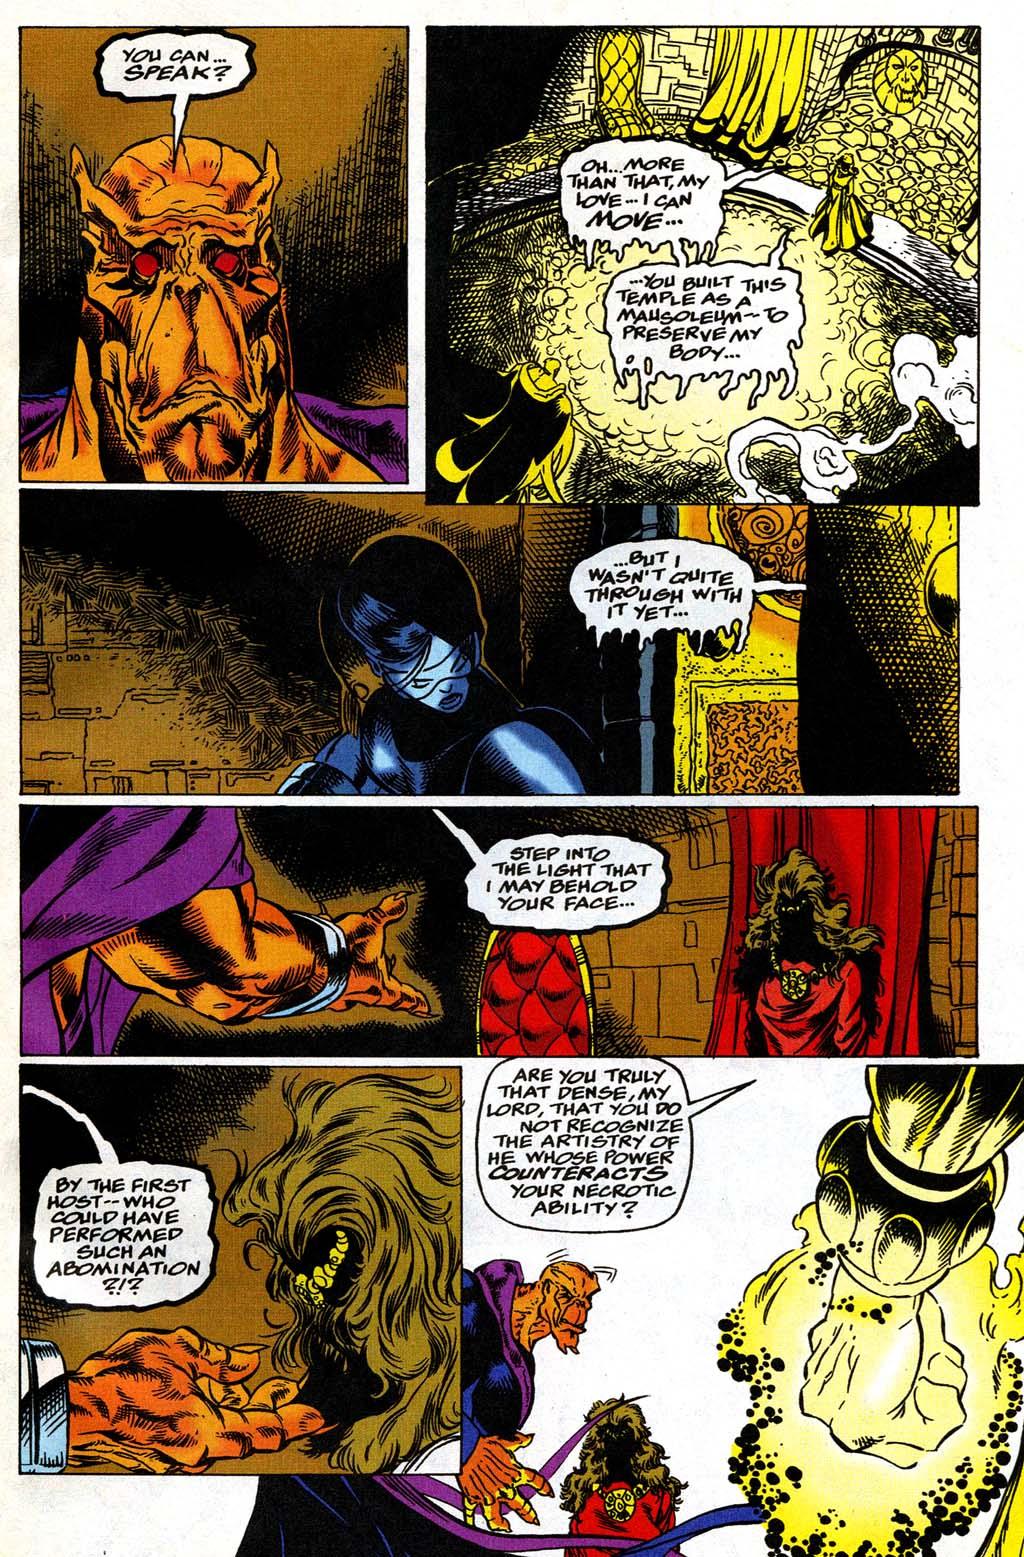 Read online Blackwulf comic -  Issue #8 - 21